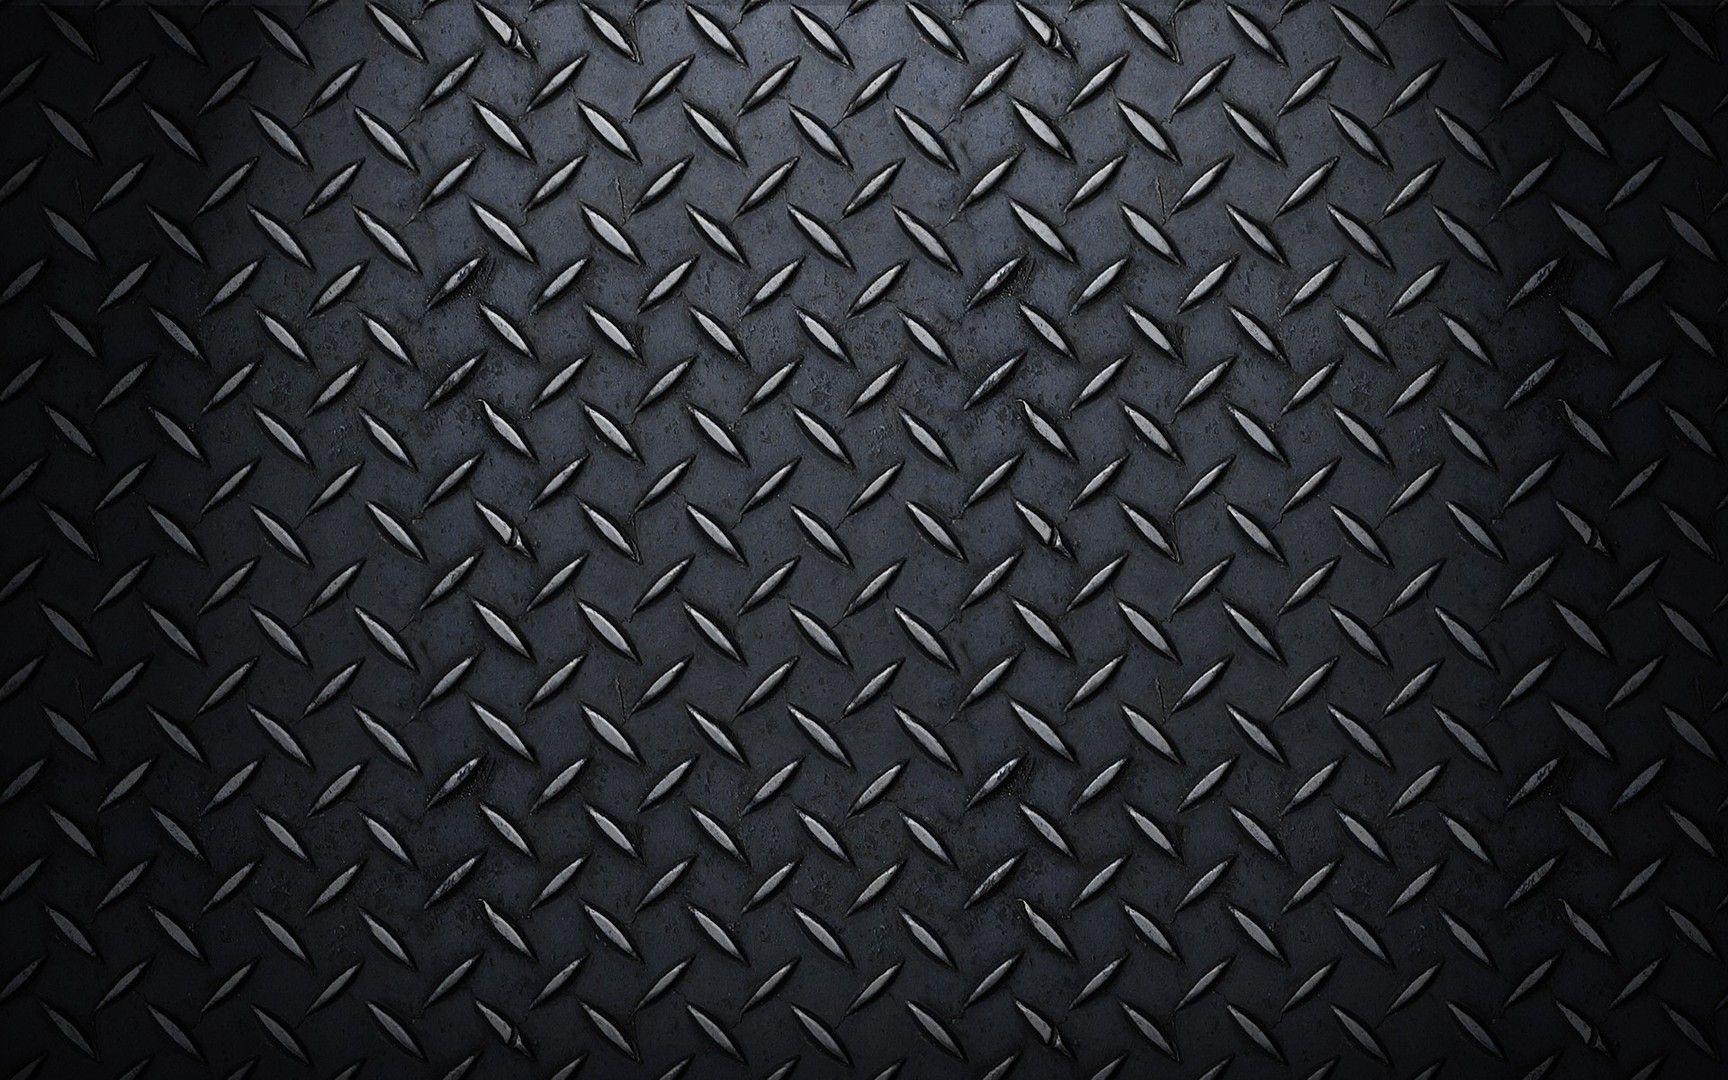 RiffelBlech 1920x1080 (Original) Kohlefaser, Metallische